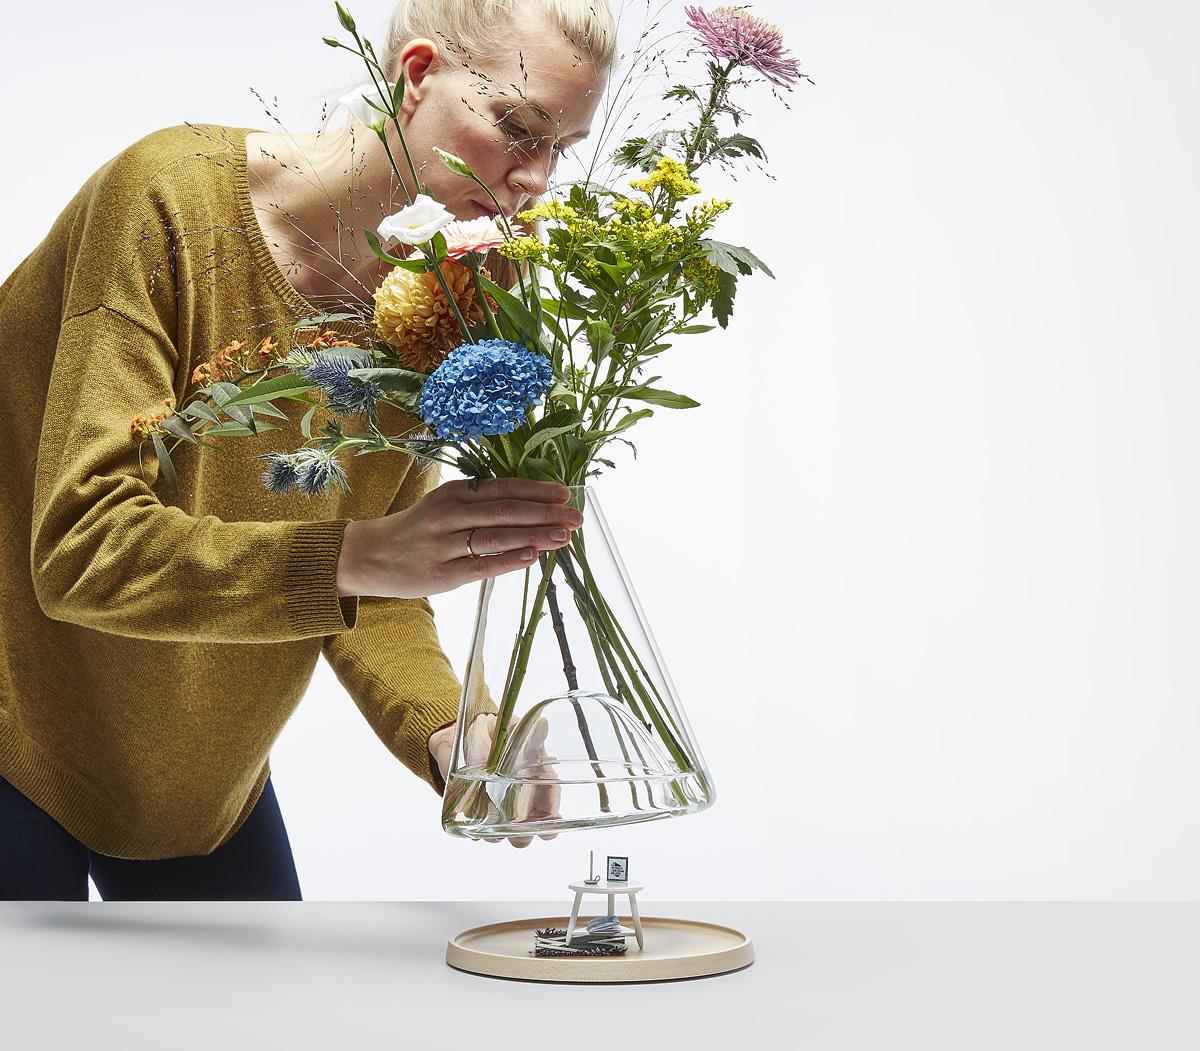 Bell-jar vase Small | Ontwerpduo.nl on jar art, jar lamp, white flowers in vase, jar box, jar candles, jar decorations, jar small vase, blue flowers in a vase, jar chandelier, jar lights, jar flower centerpieces,